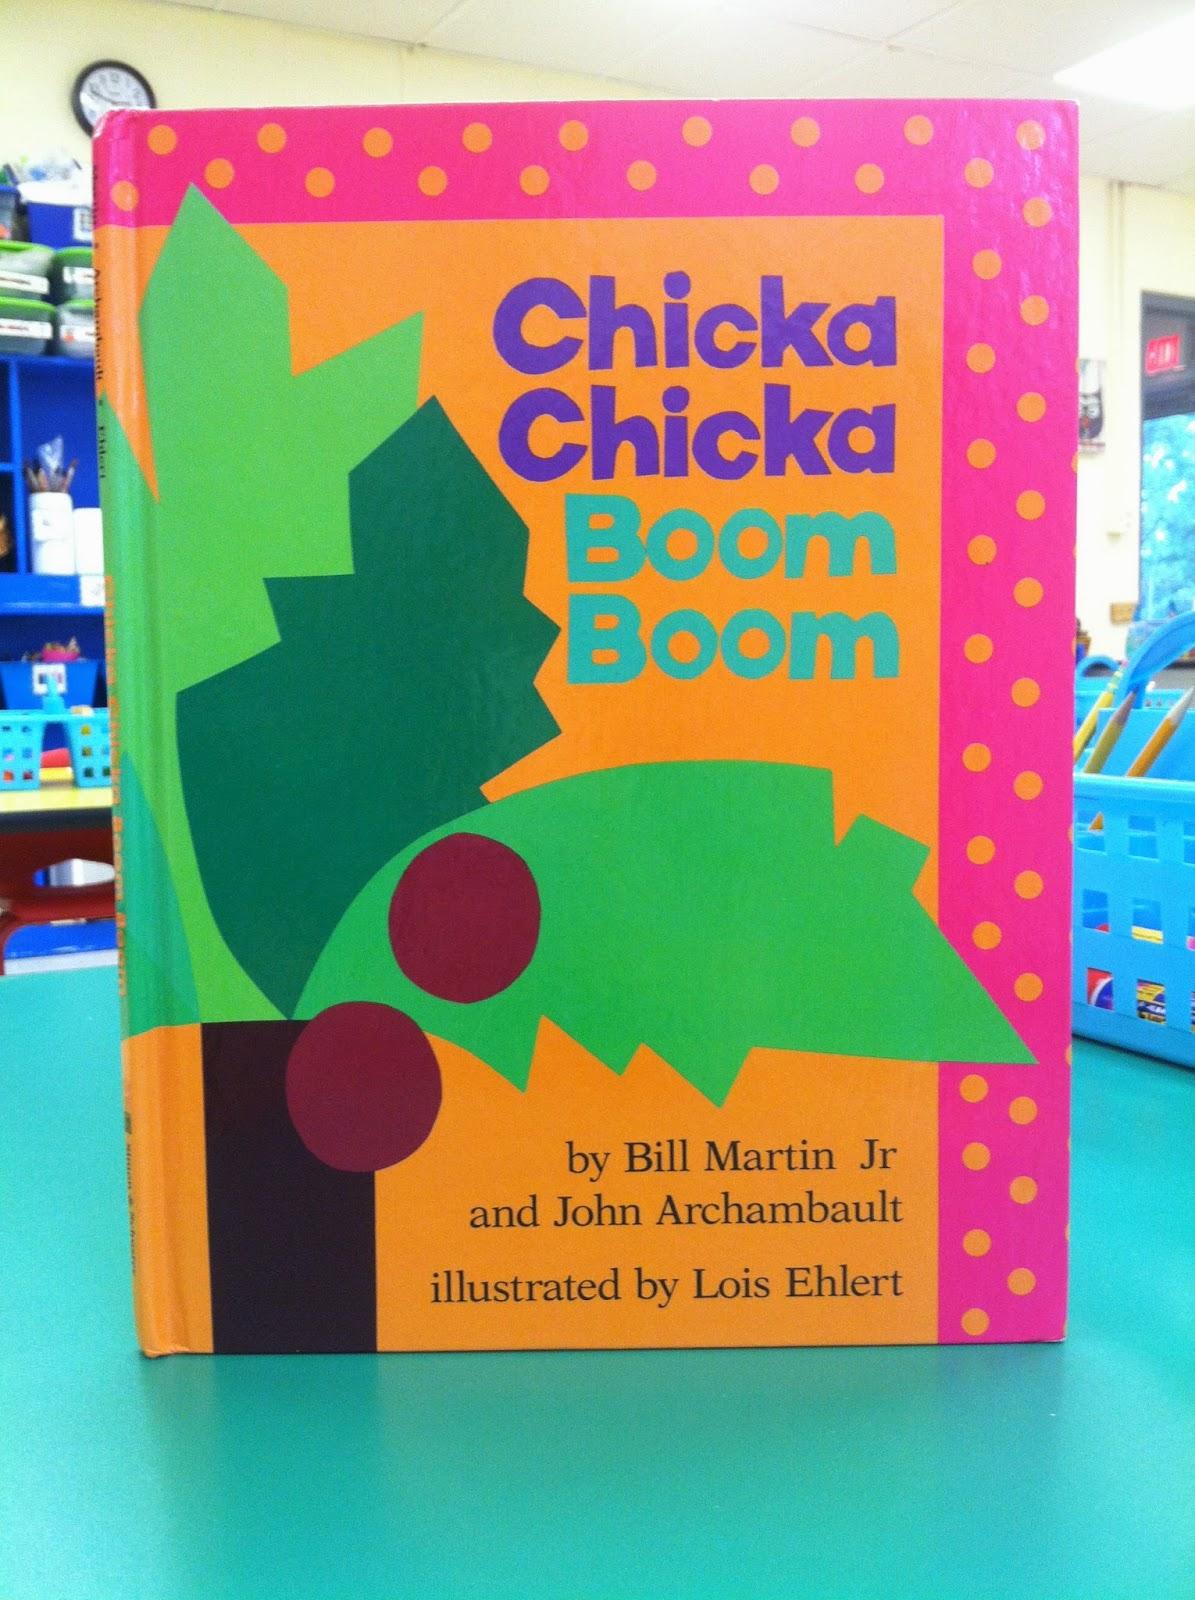 Ms. Berbert's Bright Bunch: Chicka Chicka Boom Boom, We ... - photo#33